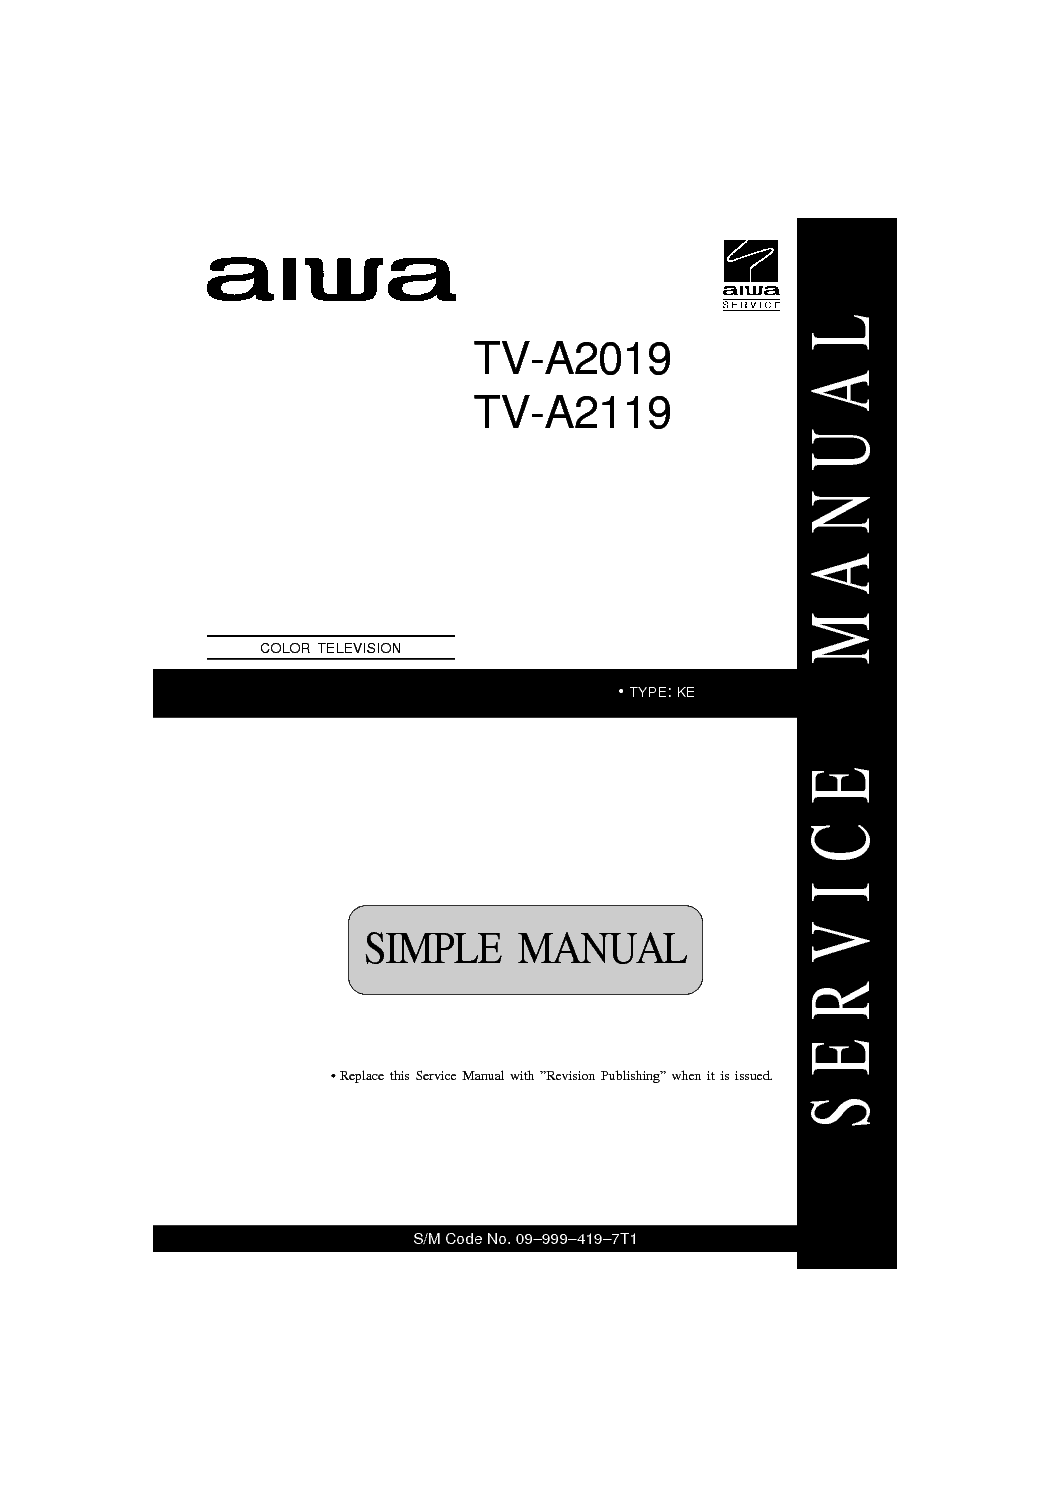 aiwa tv a2019 a2119 service manual download schematics eeprom rh elektrotanya com aiwa tv-c141ker service manual aiwa tv-c201ker service manual